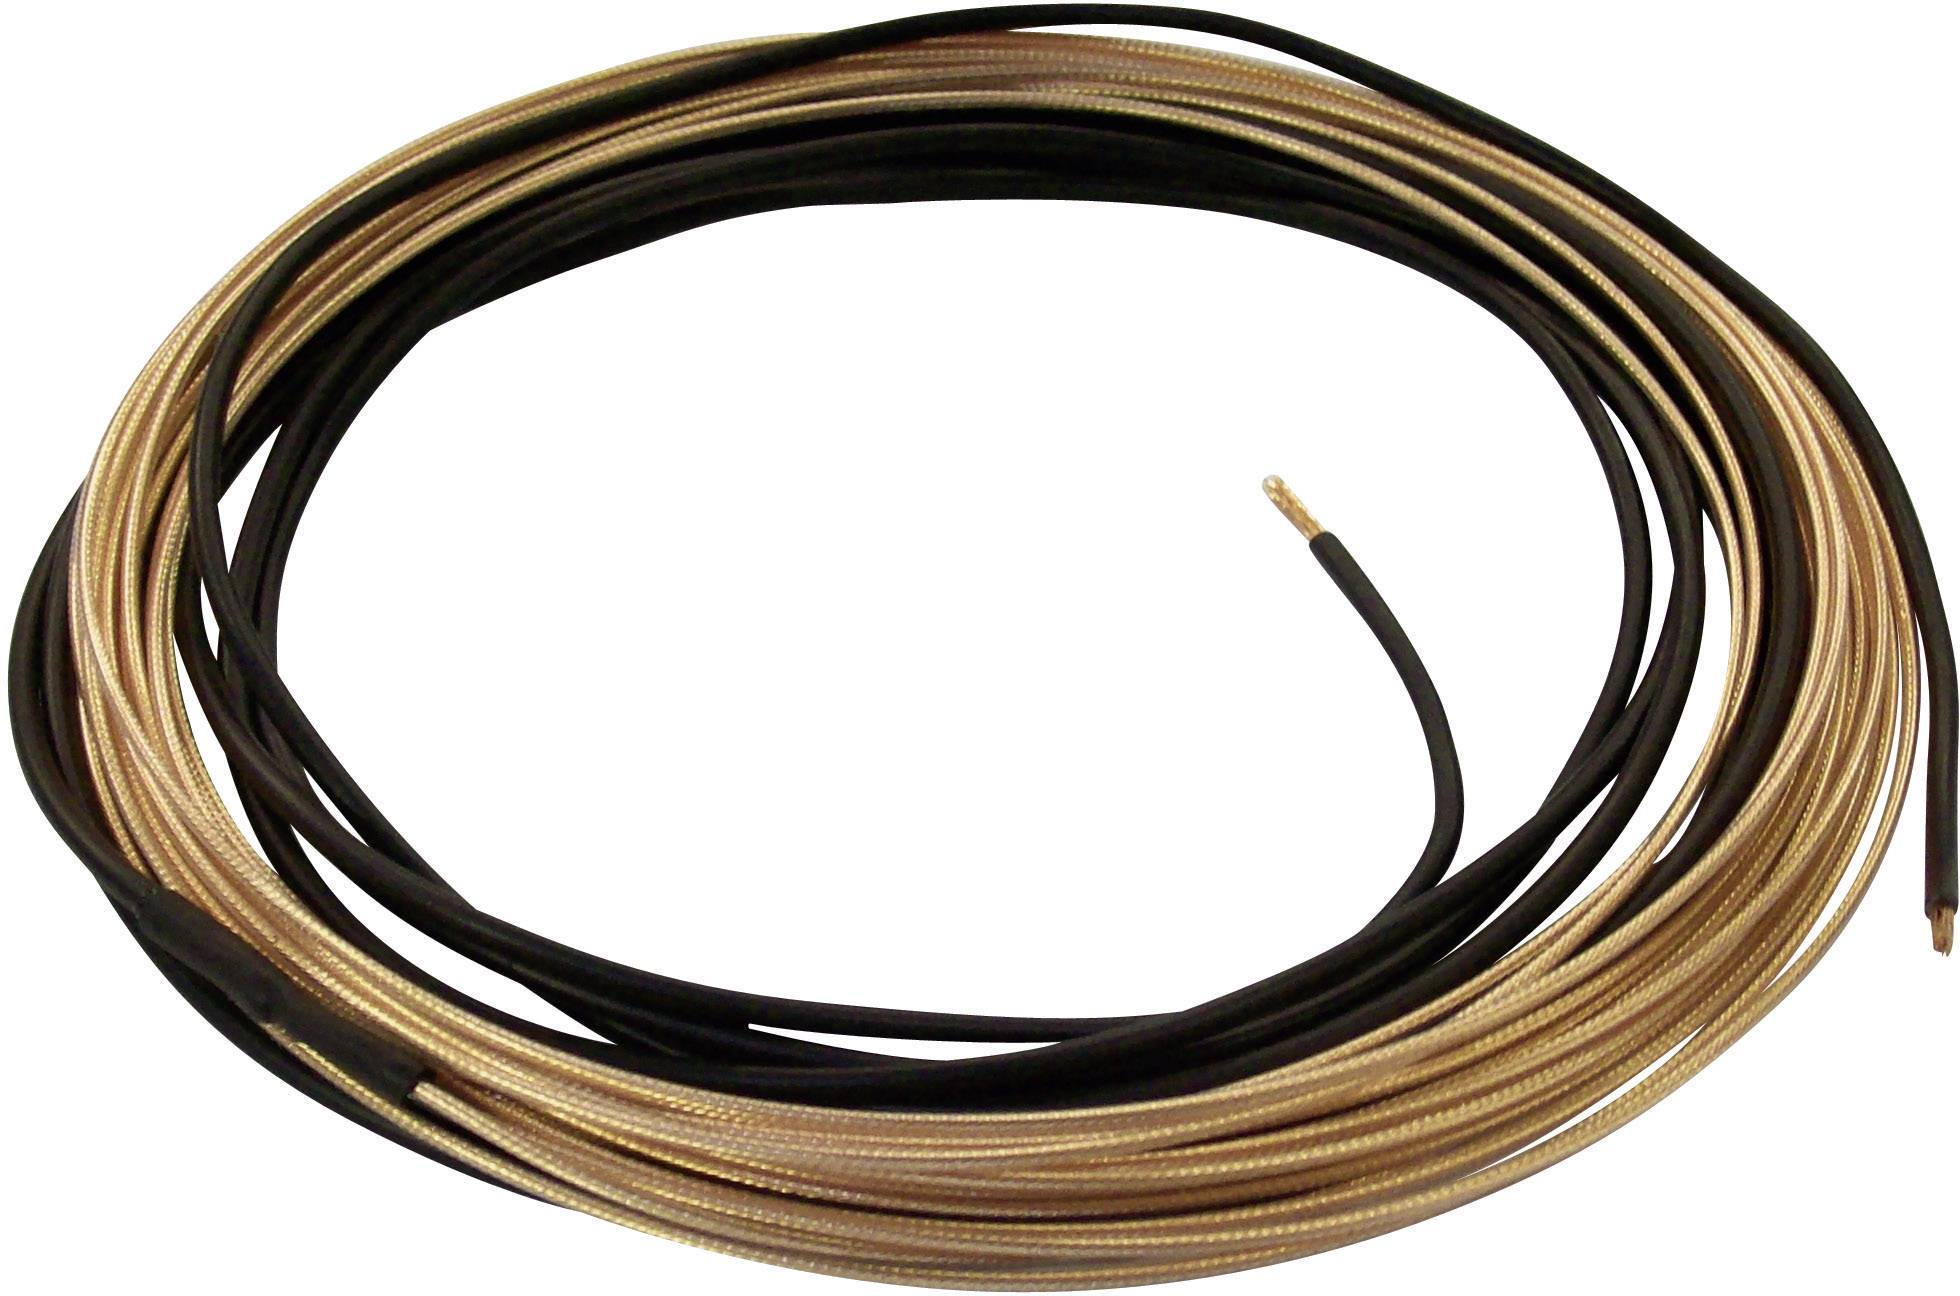 Vykurovací kábel Arnold Rak HK-12,0-12, 180 W, 12 m